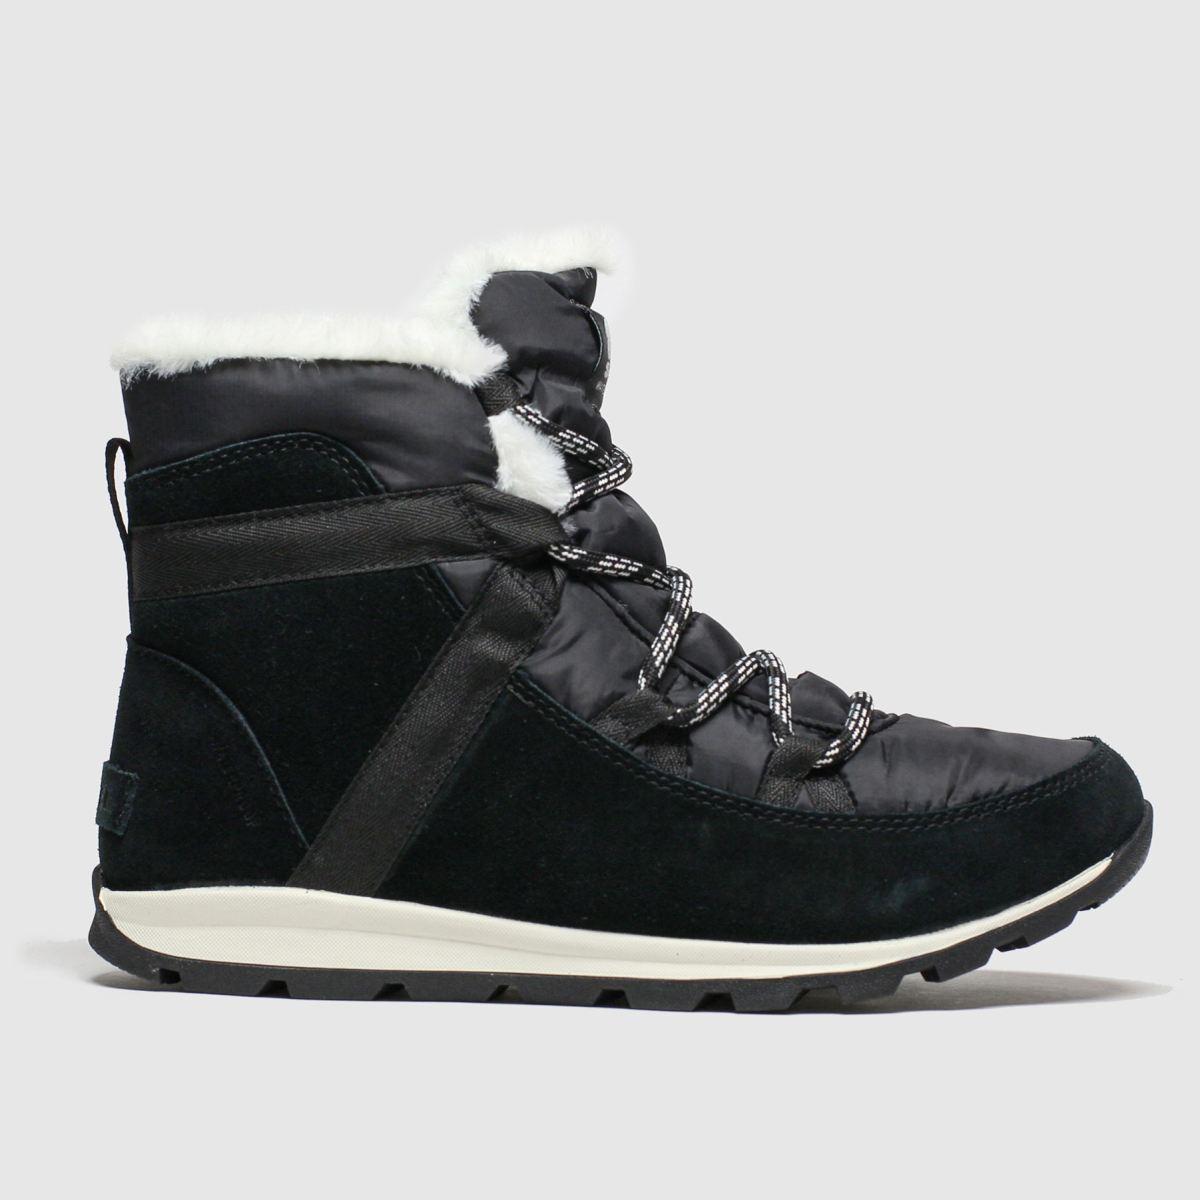 Sorel Black Whitney Flurry Boots